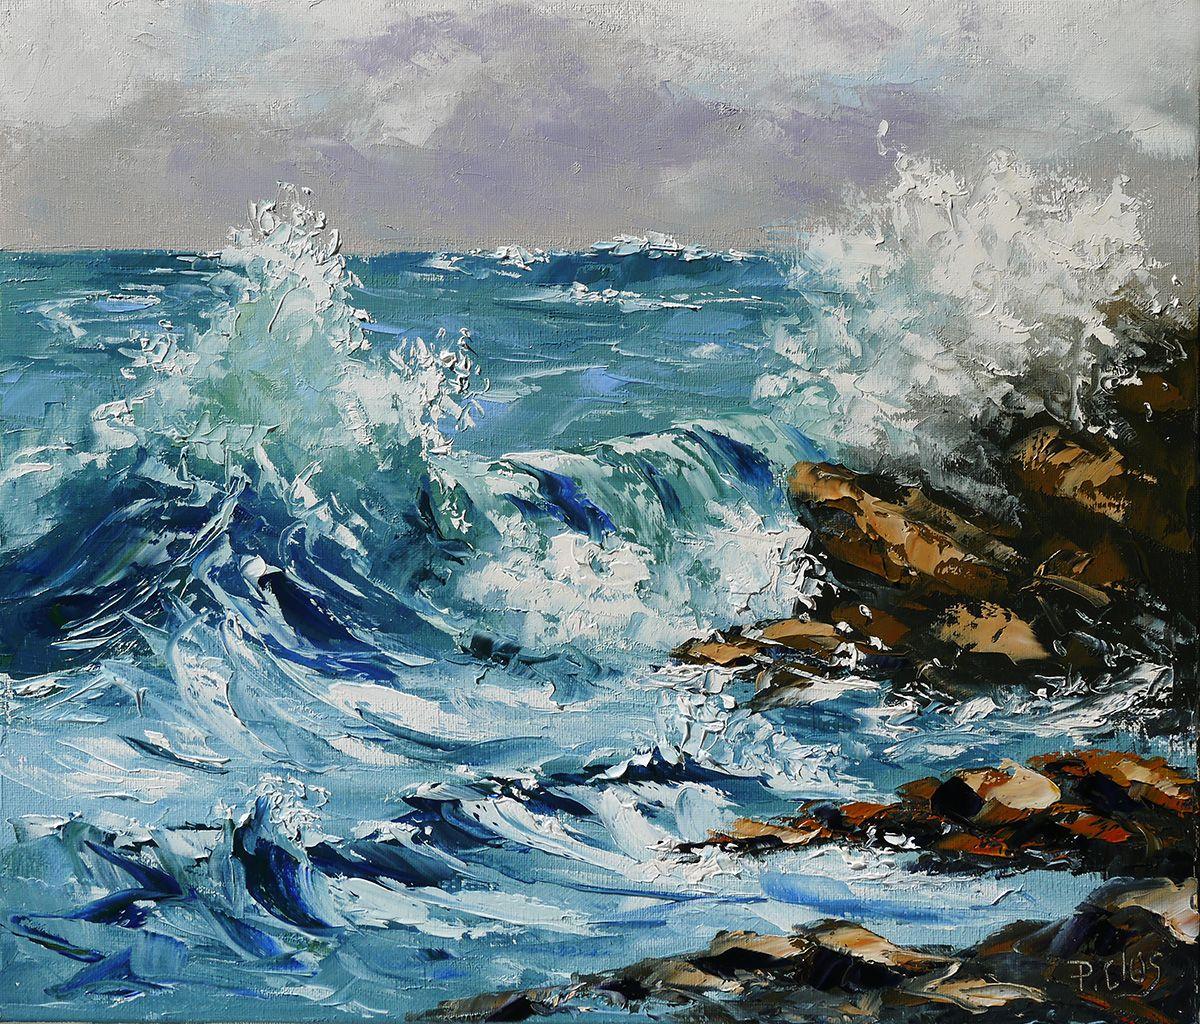 Dessin et peinture - vidéo 1821 : La mer